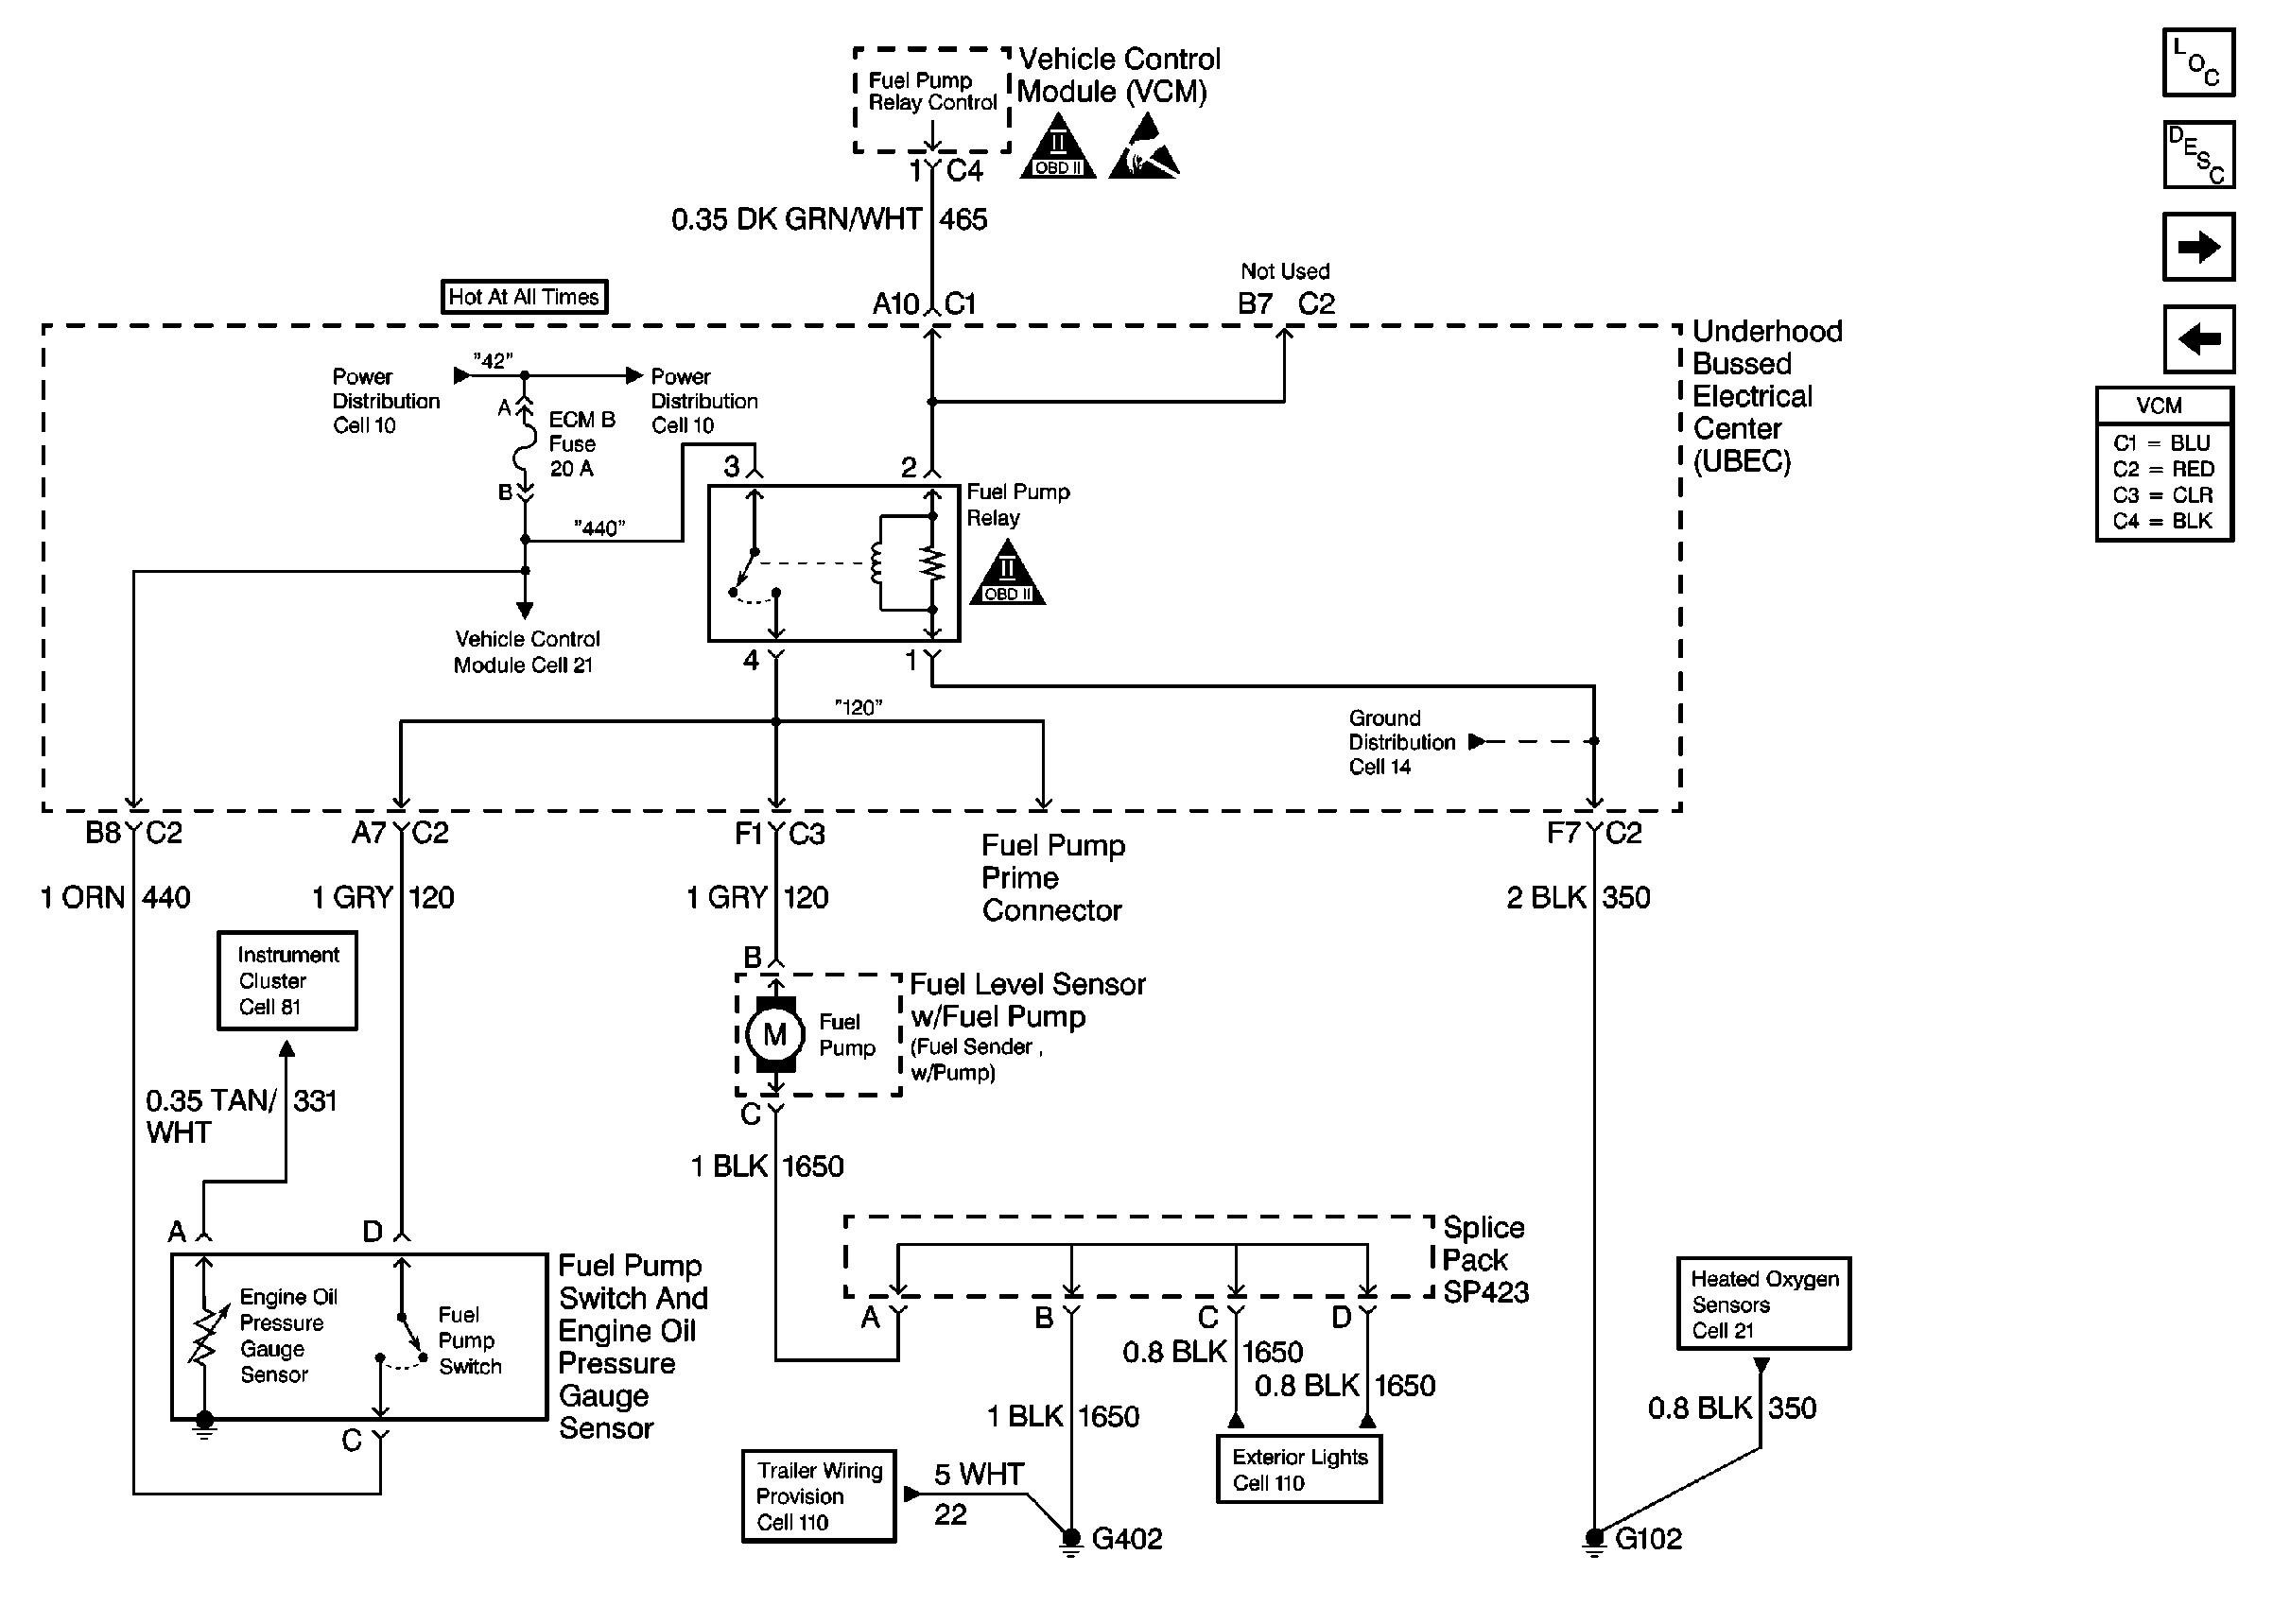 gm fuel pump wiring diagram chevrolet fuel pump wiring diagram rh  kolnetanya Chevy Wiring diagrams s10 1998 Chevy S10 2 2 Engine ...